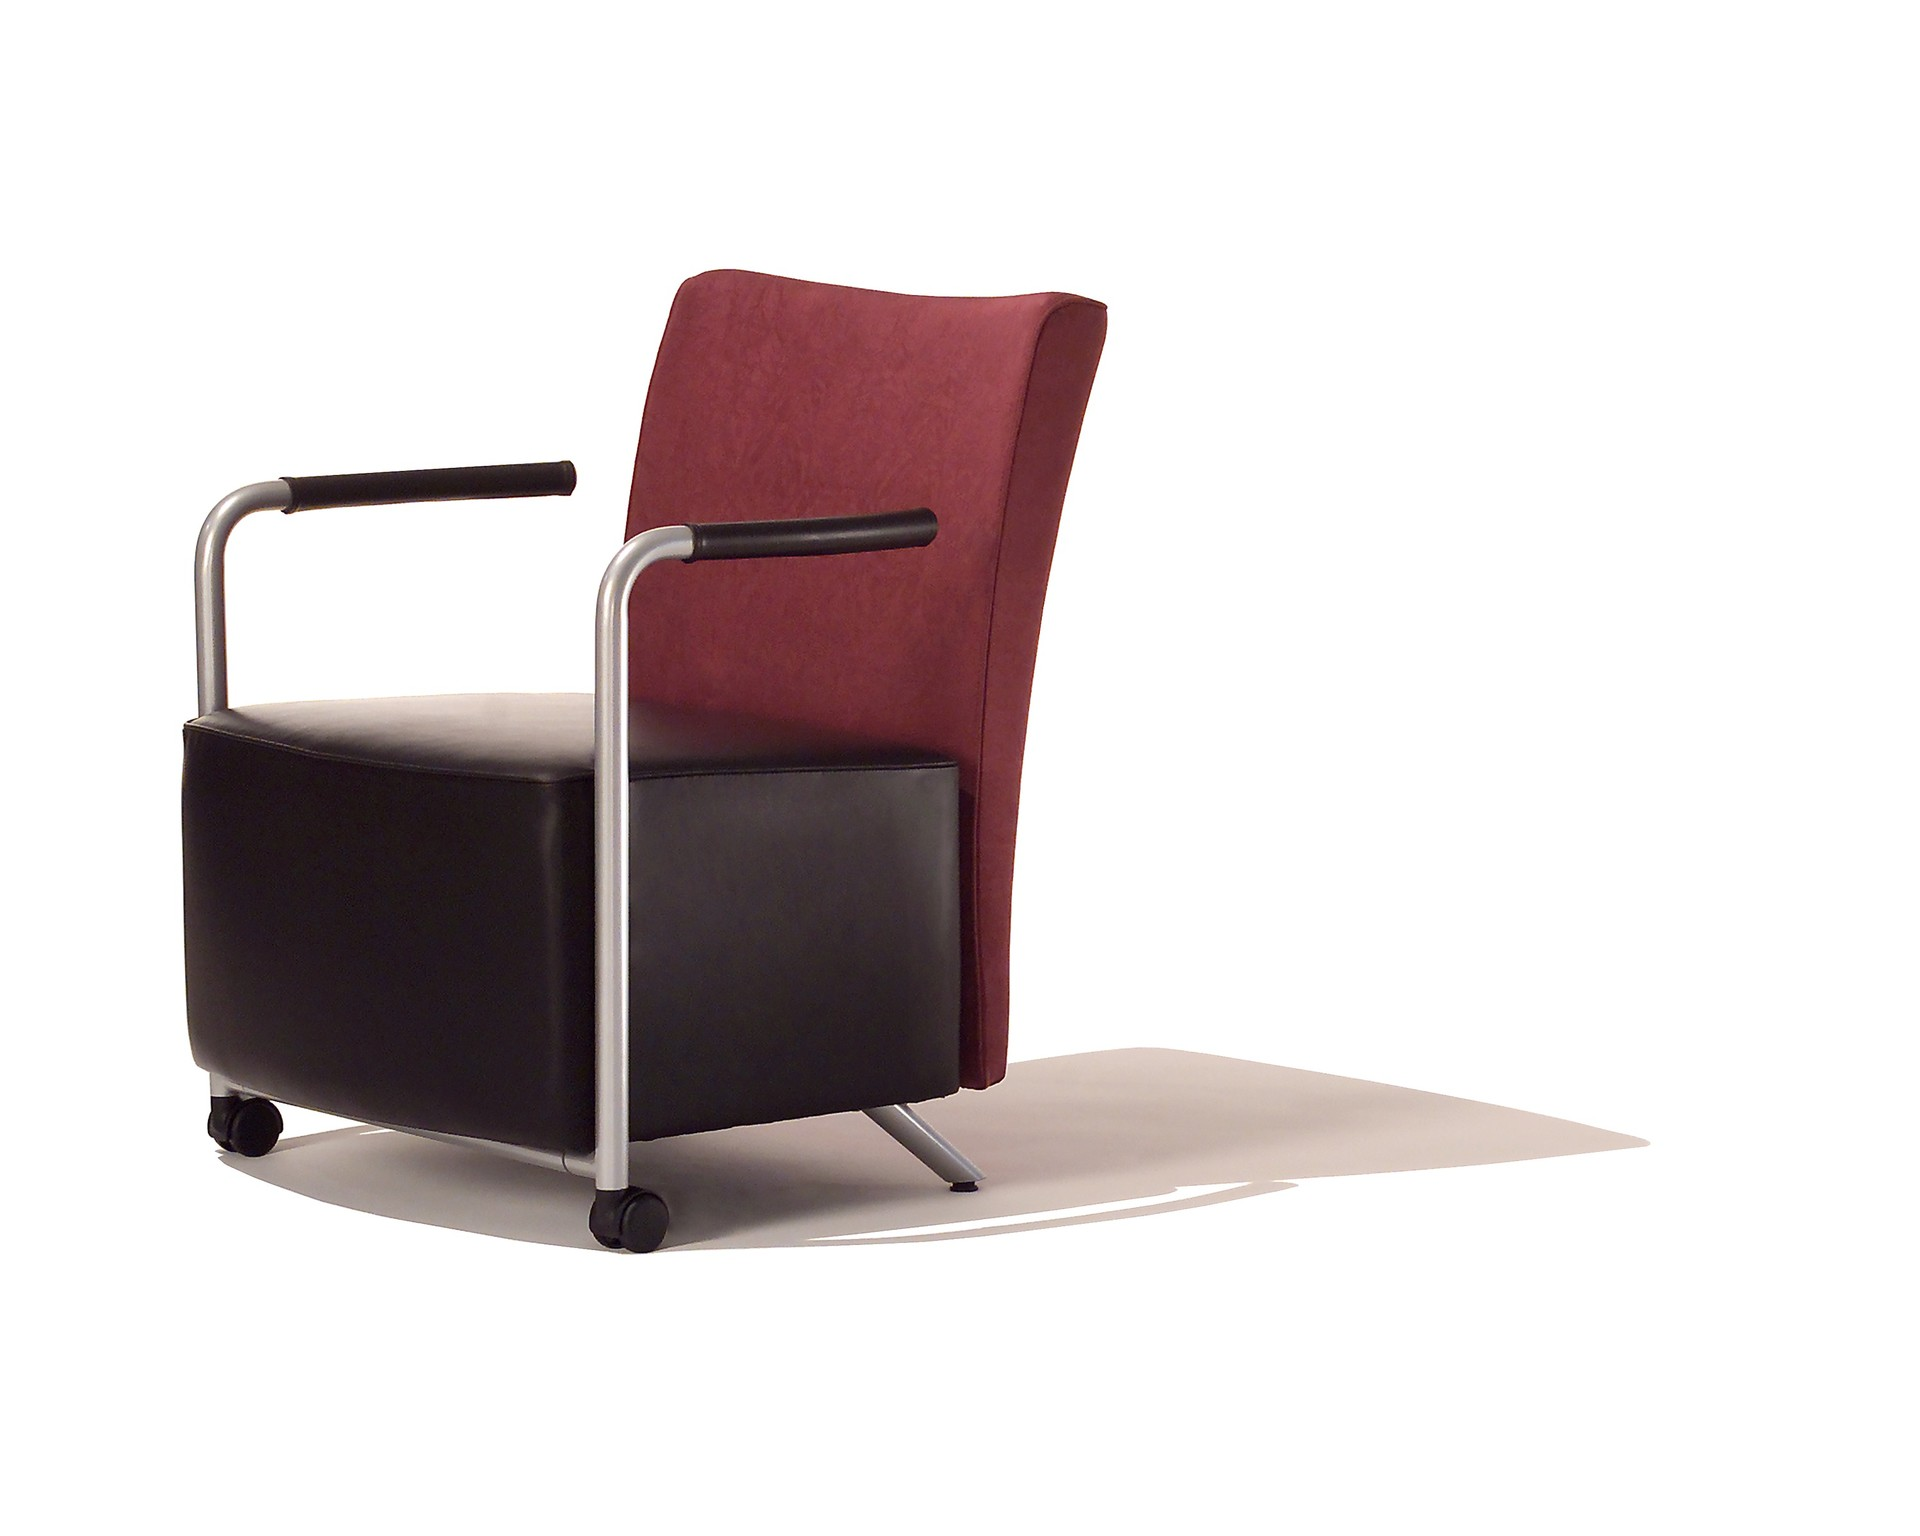 5-Silla-Lounge-Celeste-Compacto-1920